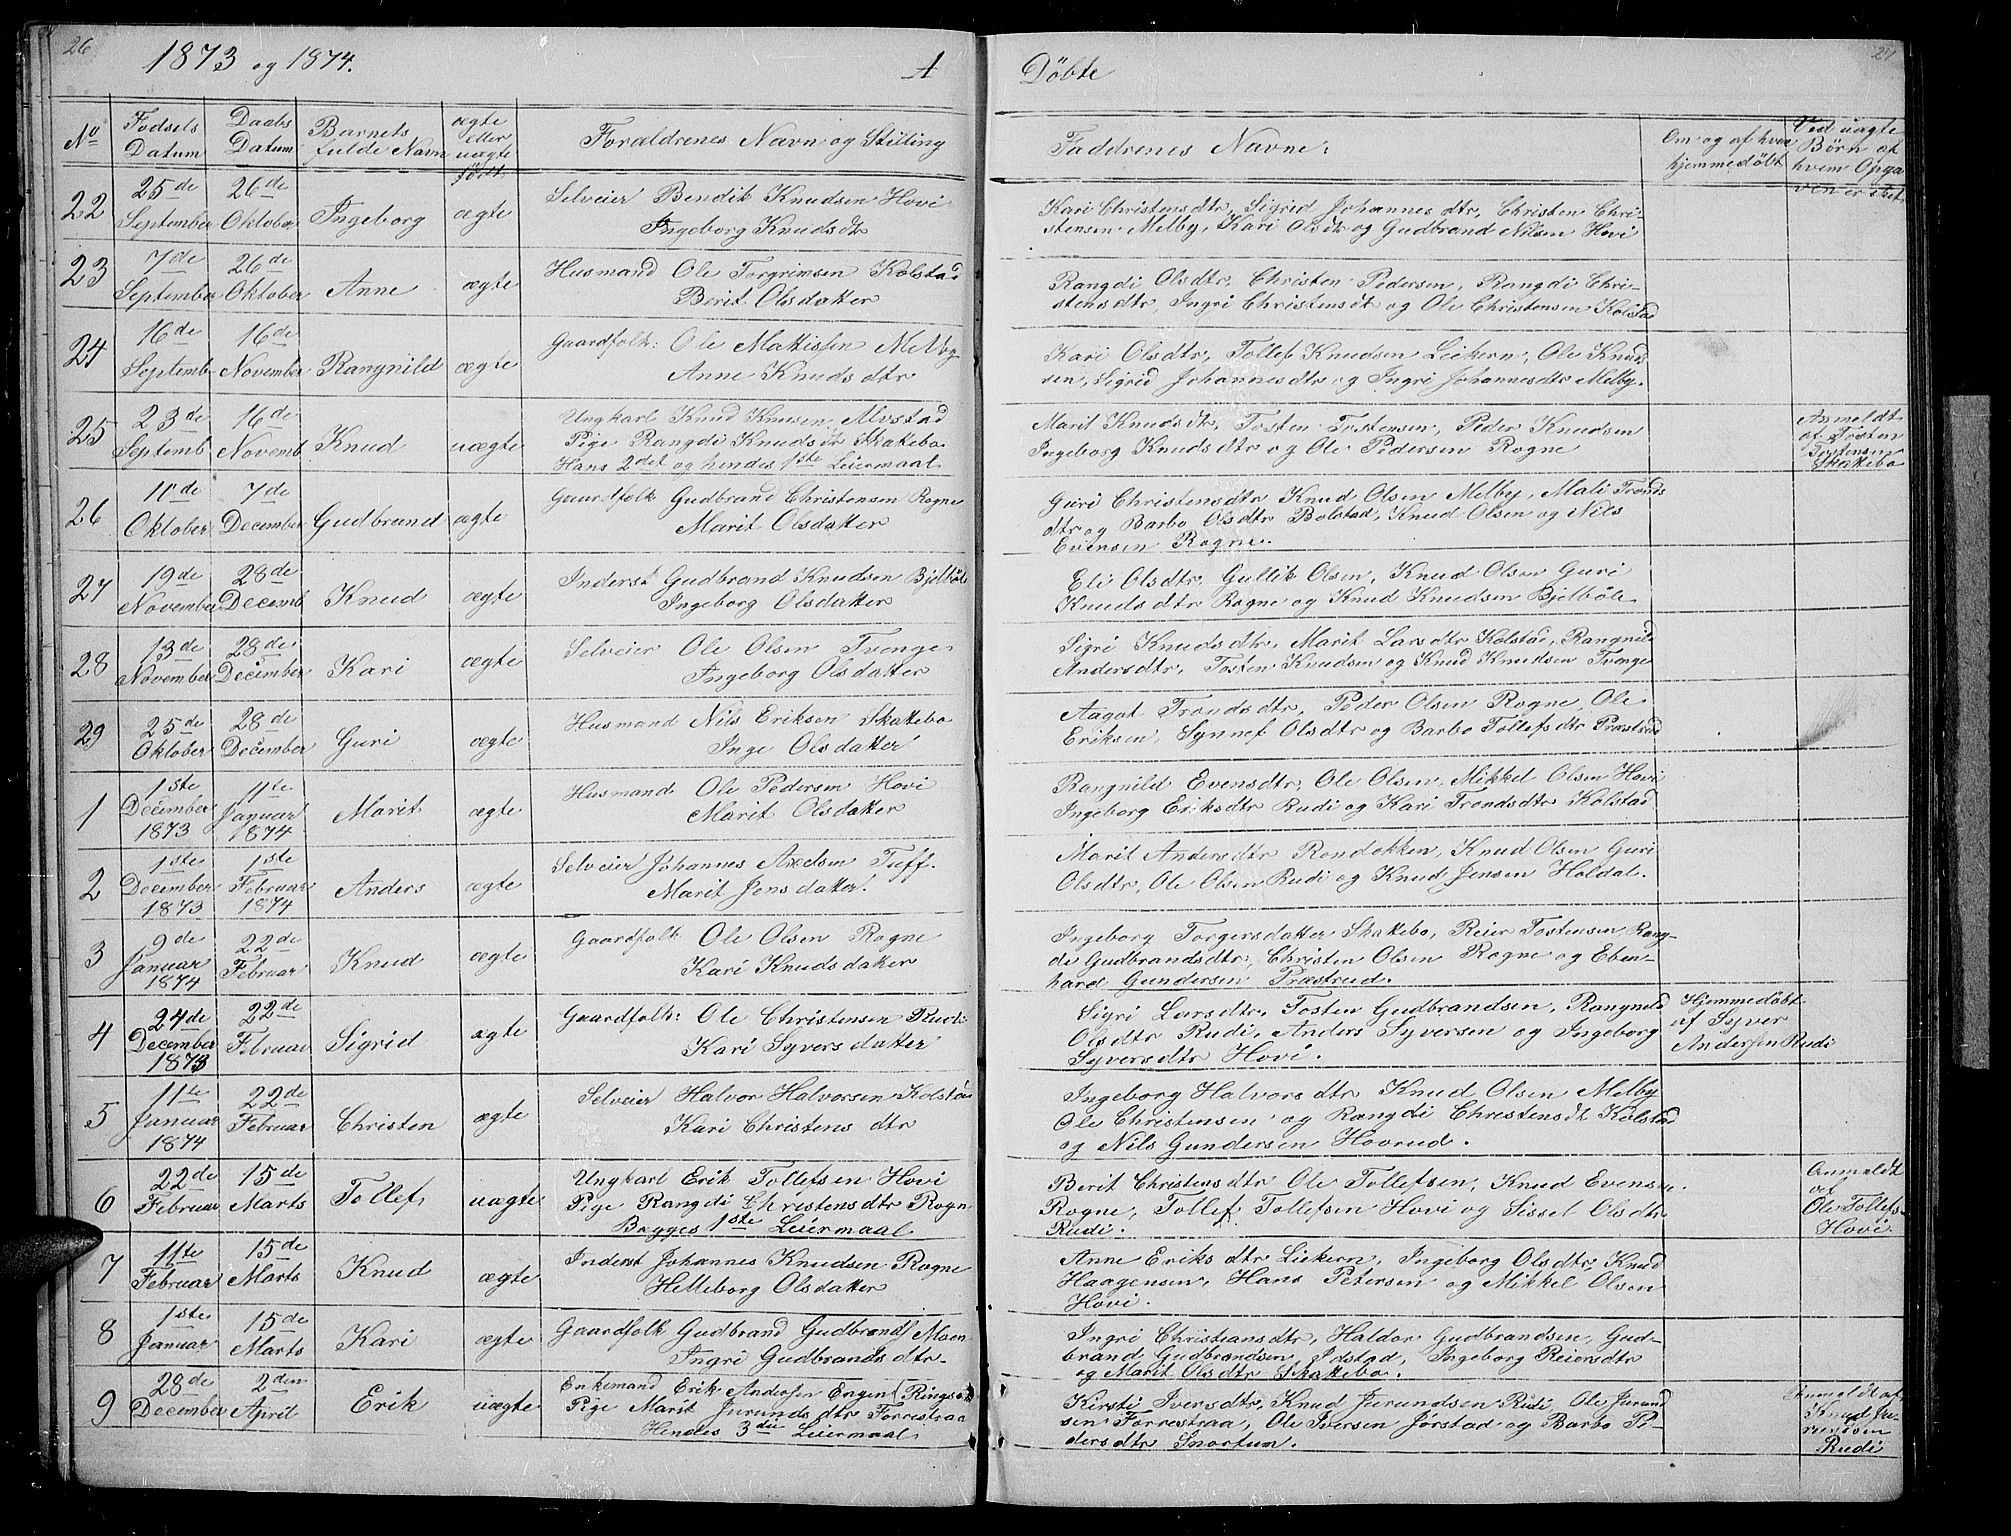 SAH, Øystre Slidre prestekontor, Klokkerbok nr. 3, 1866-1886, s. 26-27